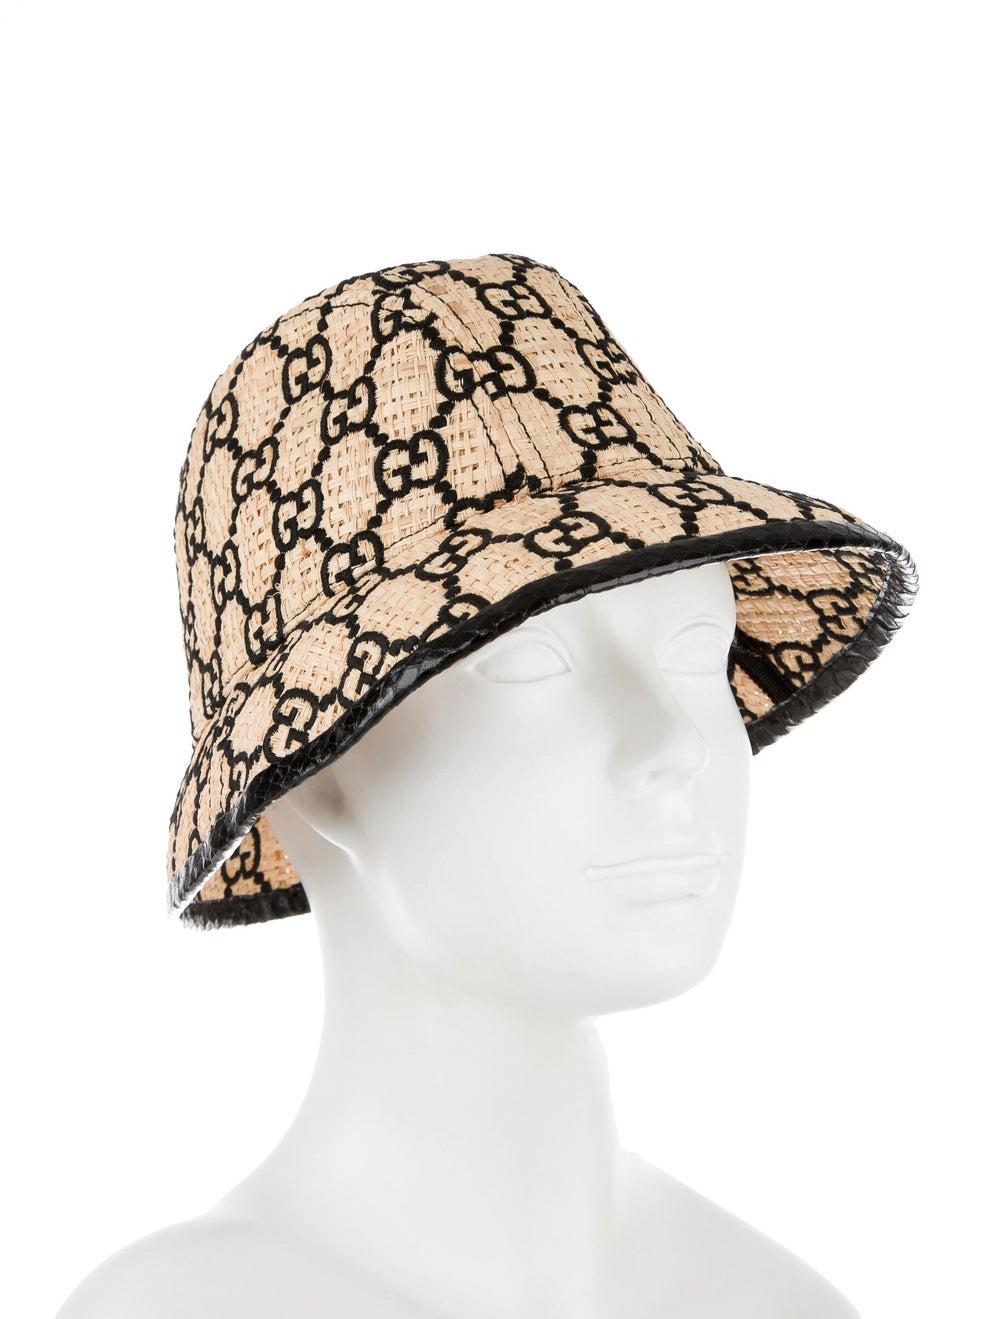 Gucci GG Straw Fedora Hat Tan - image 3